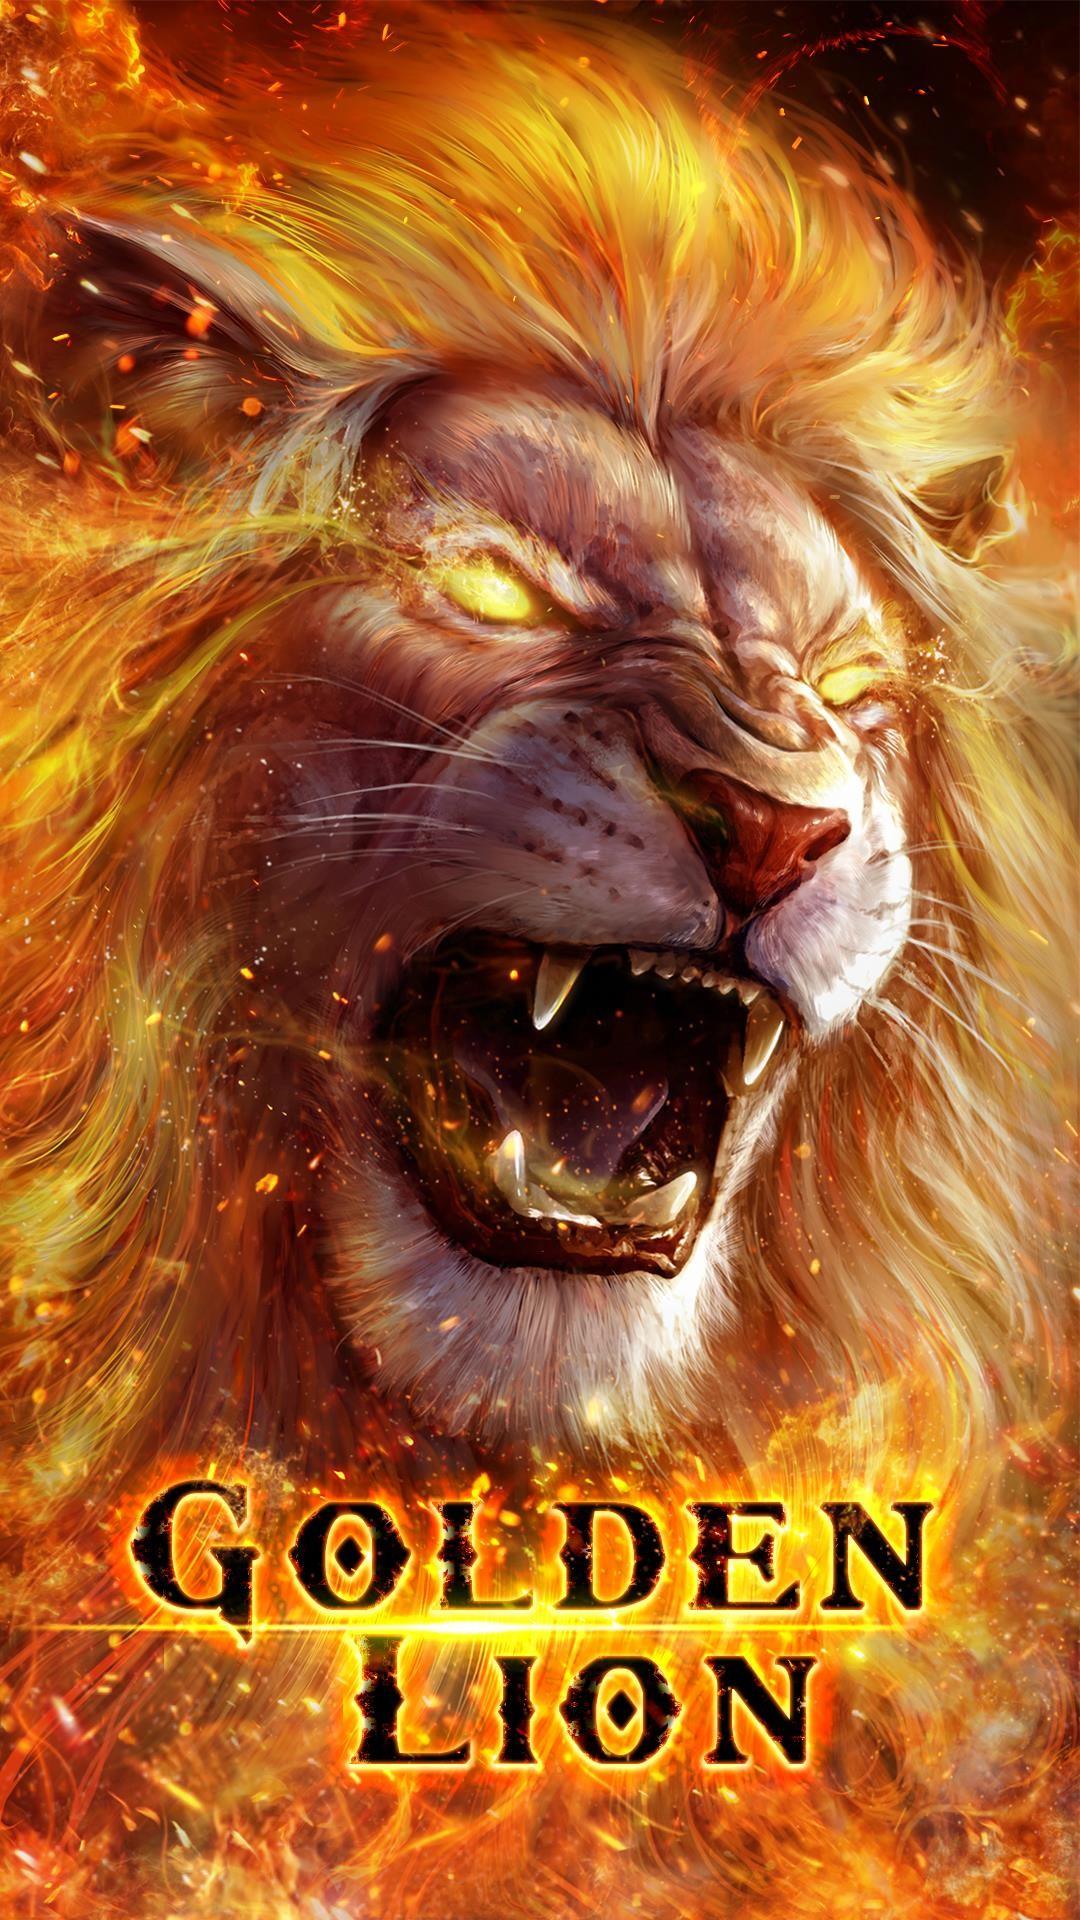 Explore Lions Live, Roaring Lion, and more!